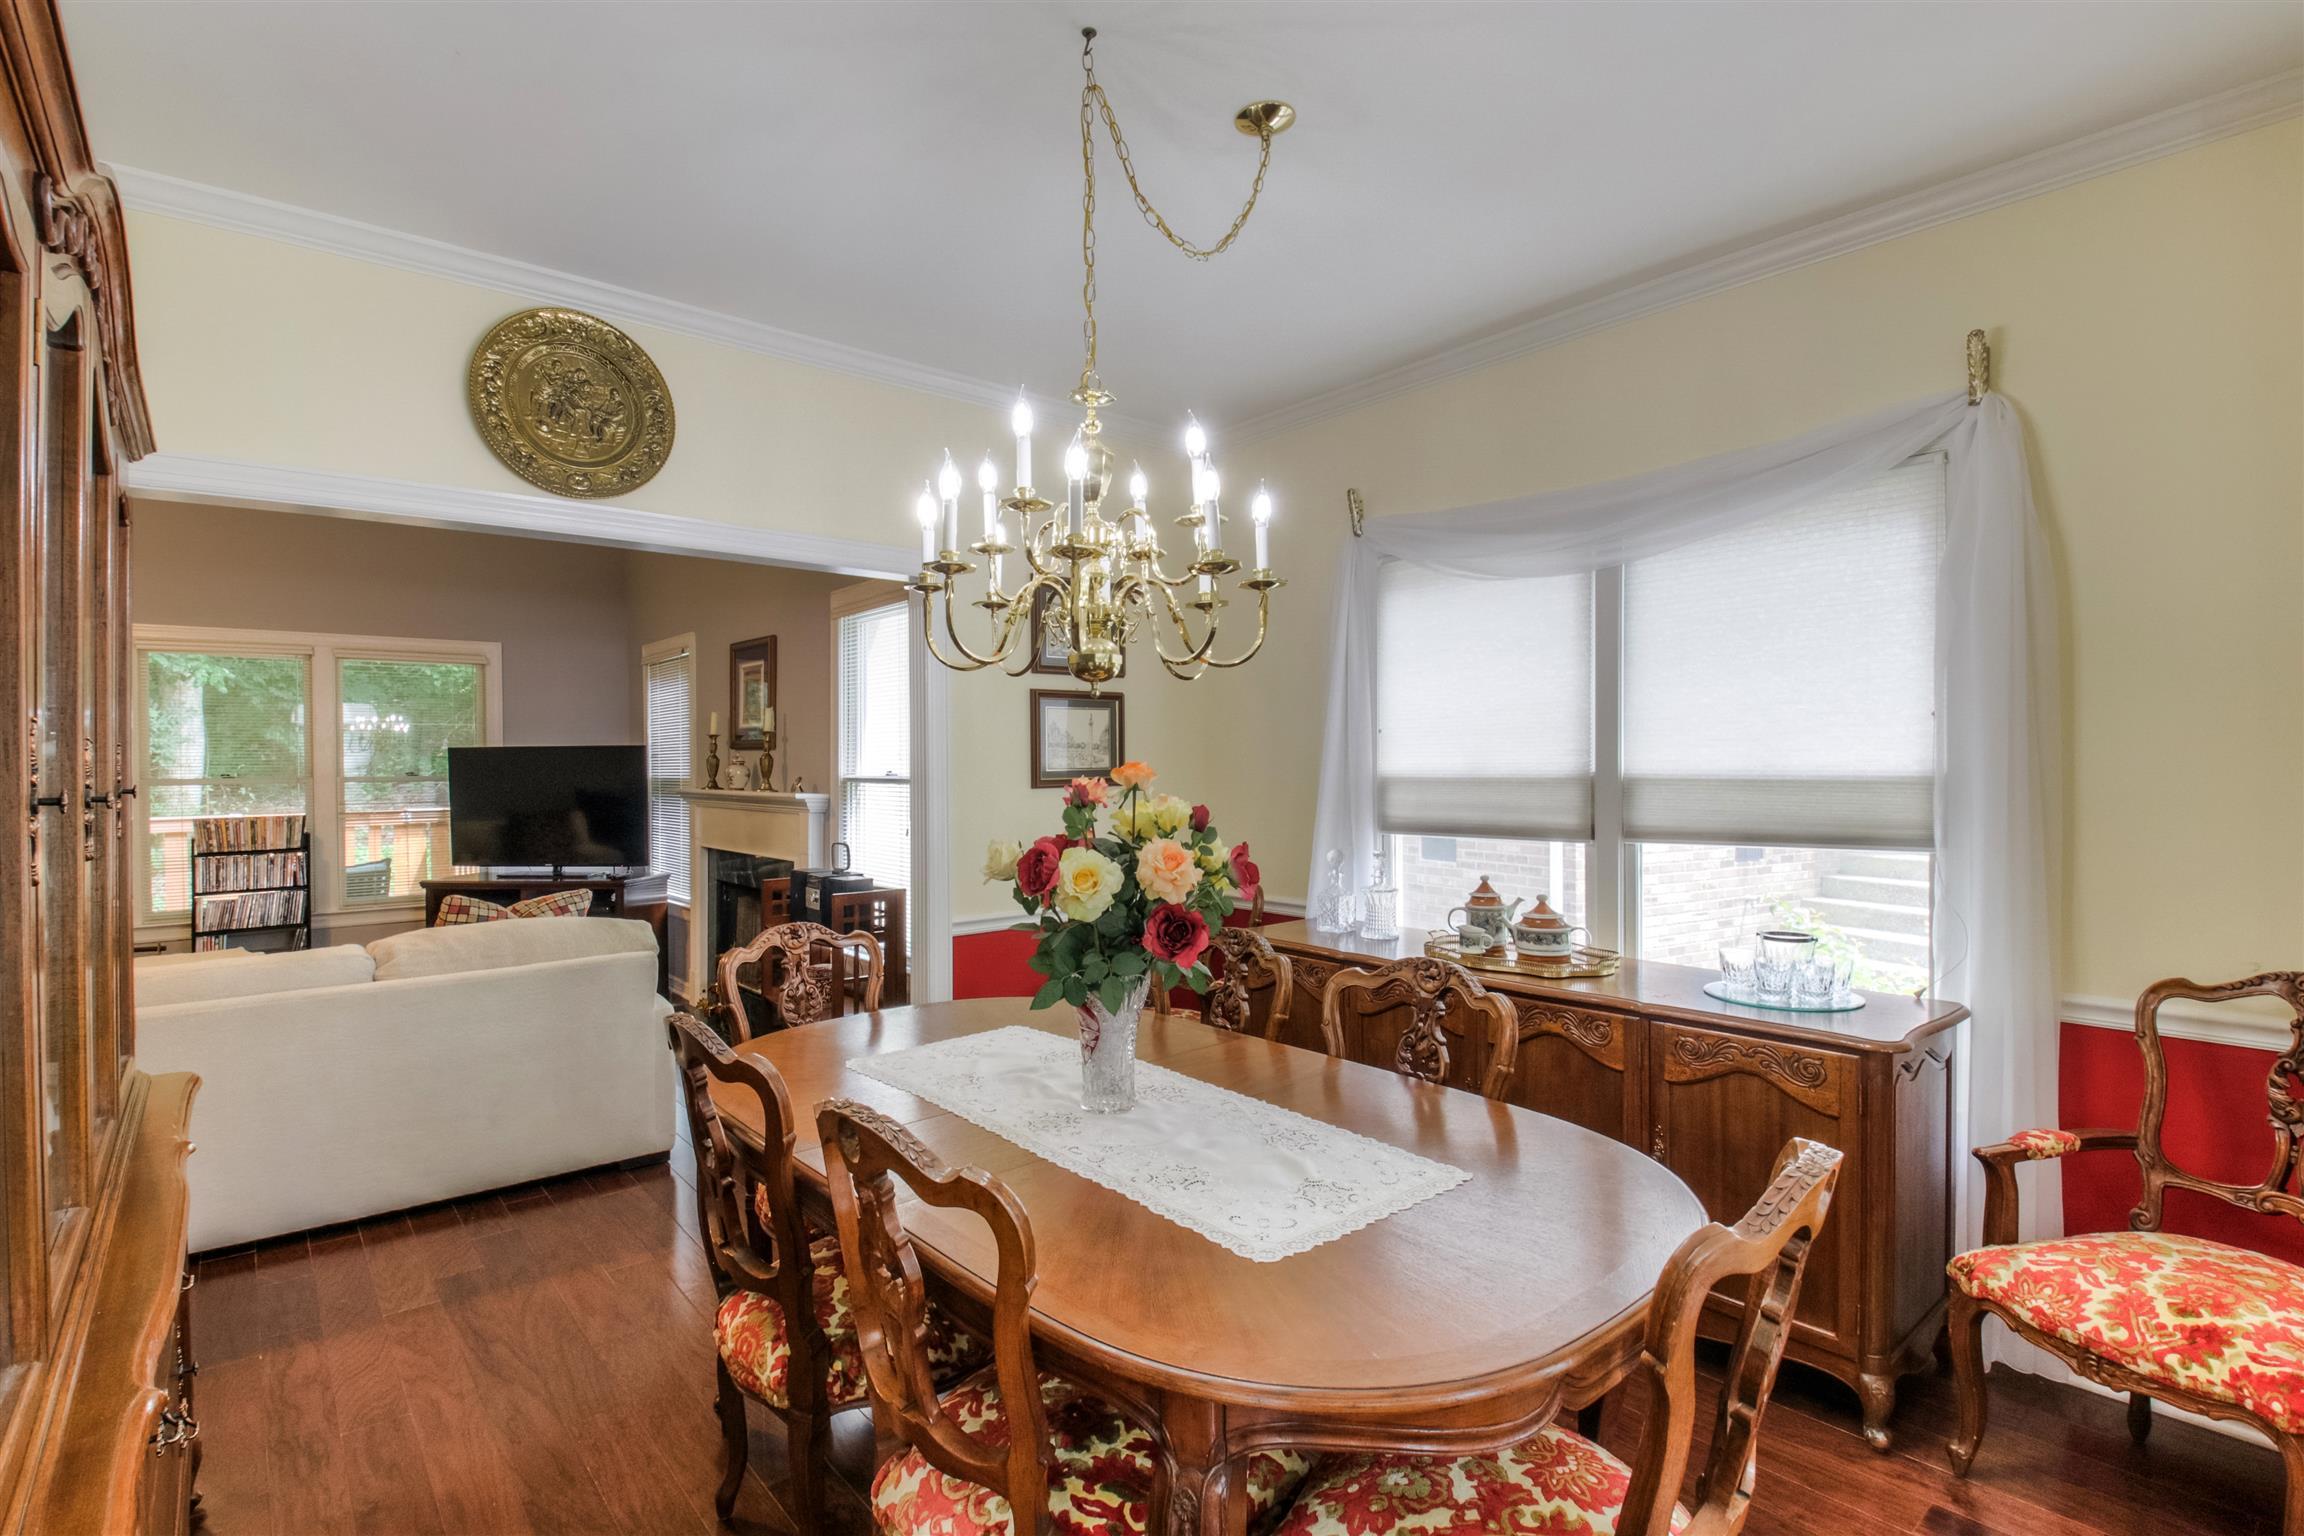 Listing: 2424 Devon Valley Dr, Nashville, TN.| MLS# 1941900 | Premier  Realty At Center Hill Lake | 615 597 2525 | Smithville TN Homes For Sale